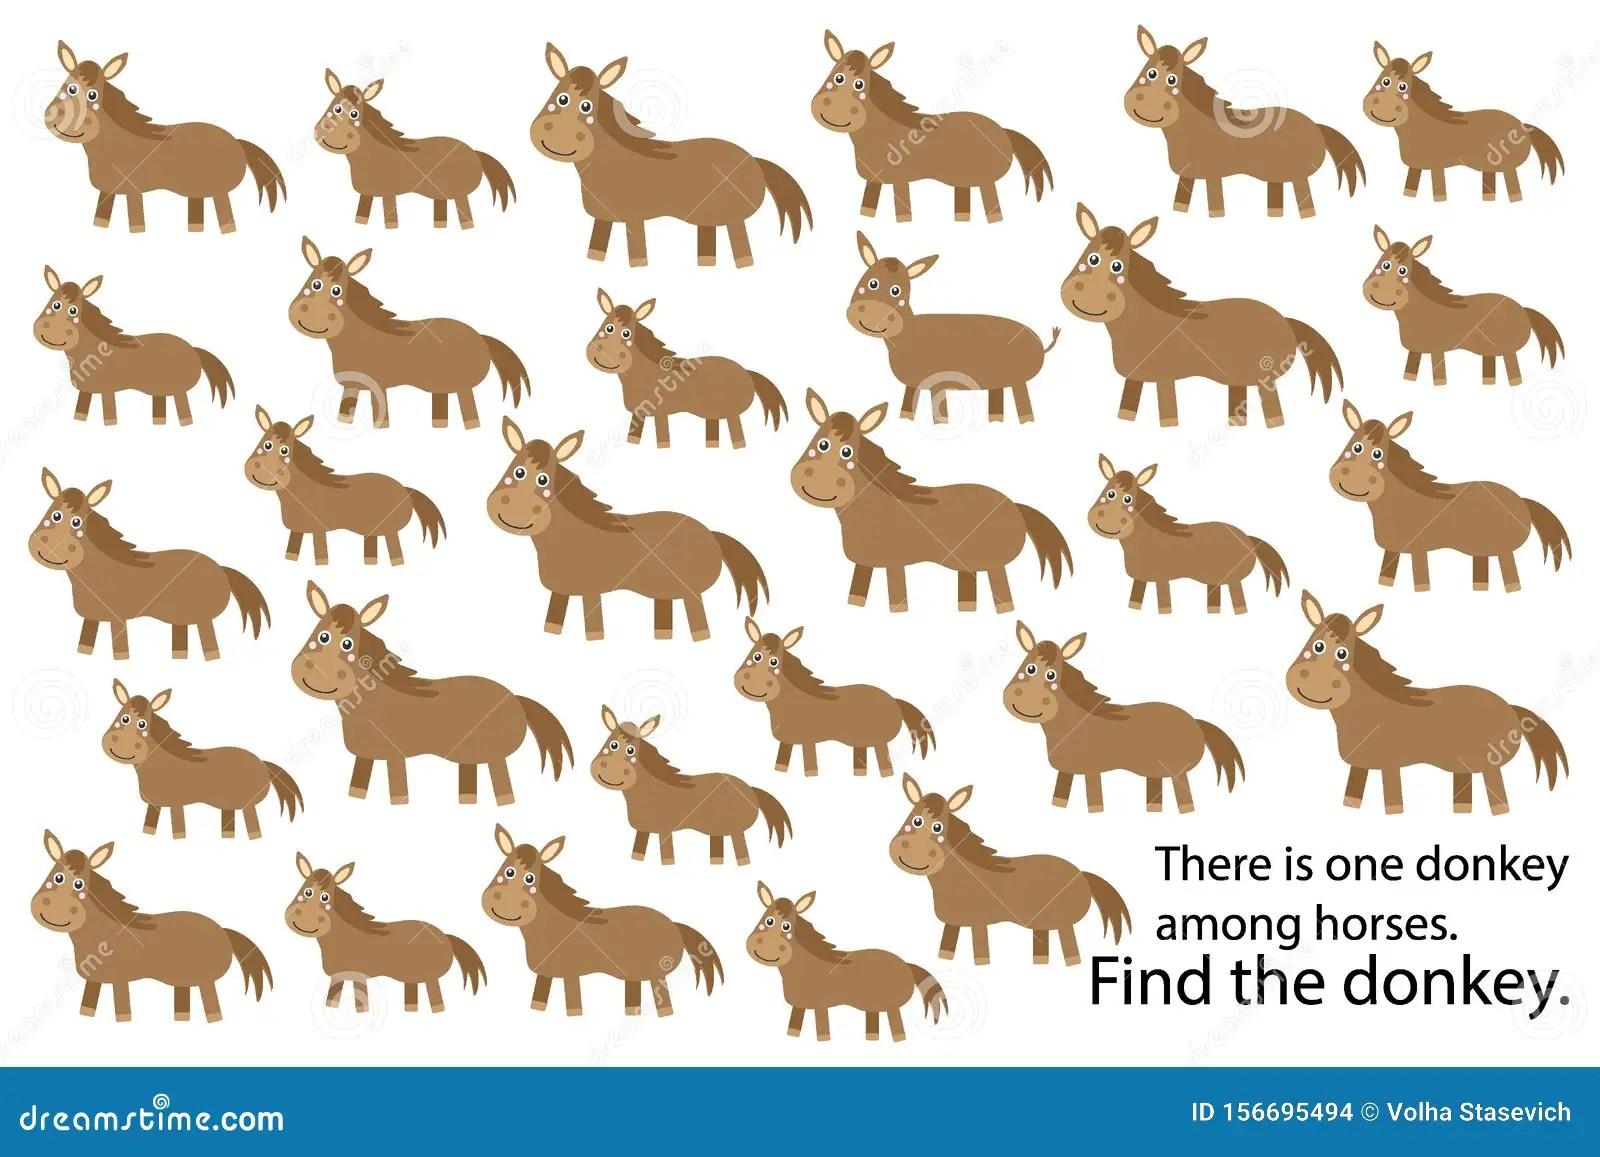 Find Donkey Among Horses Education Puzzle Game For